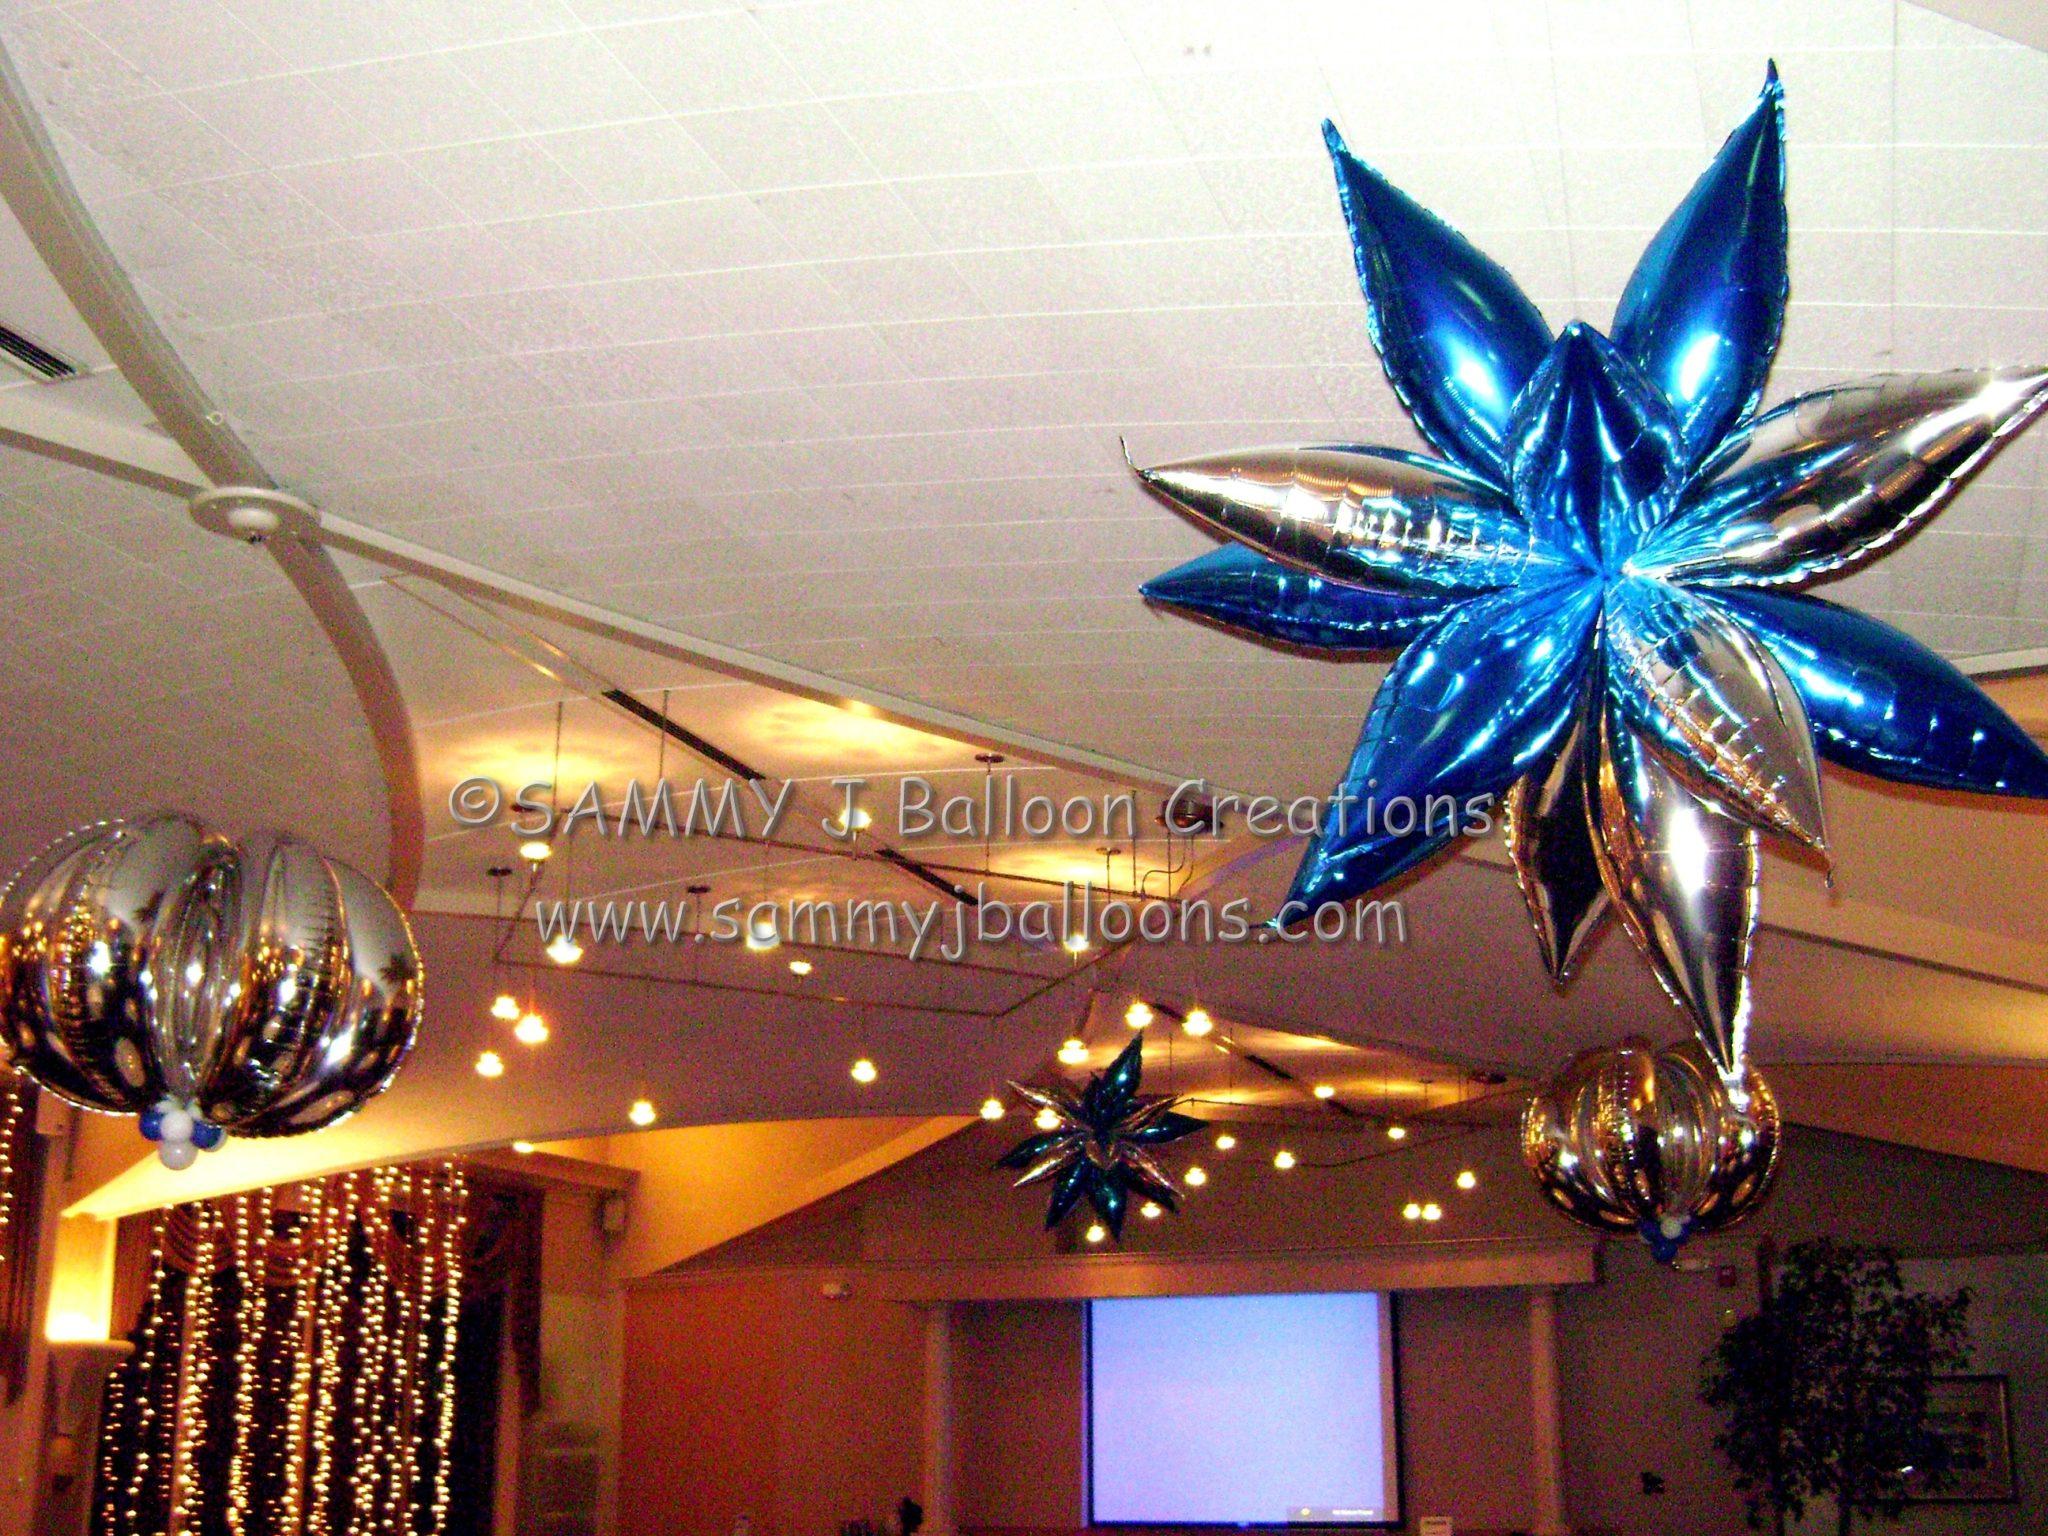 SAMMY J Balloon Creations st louis balloons foil star